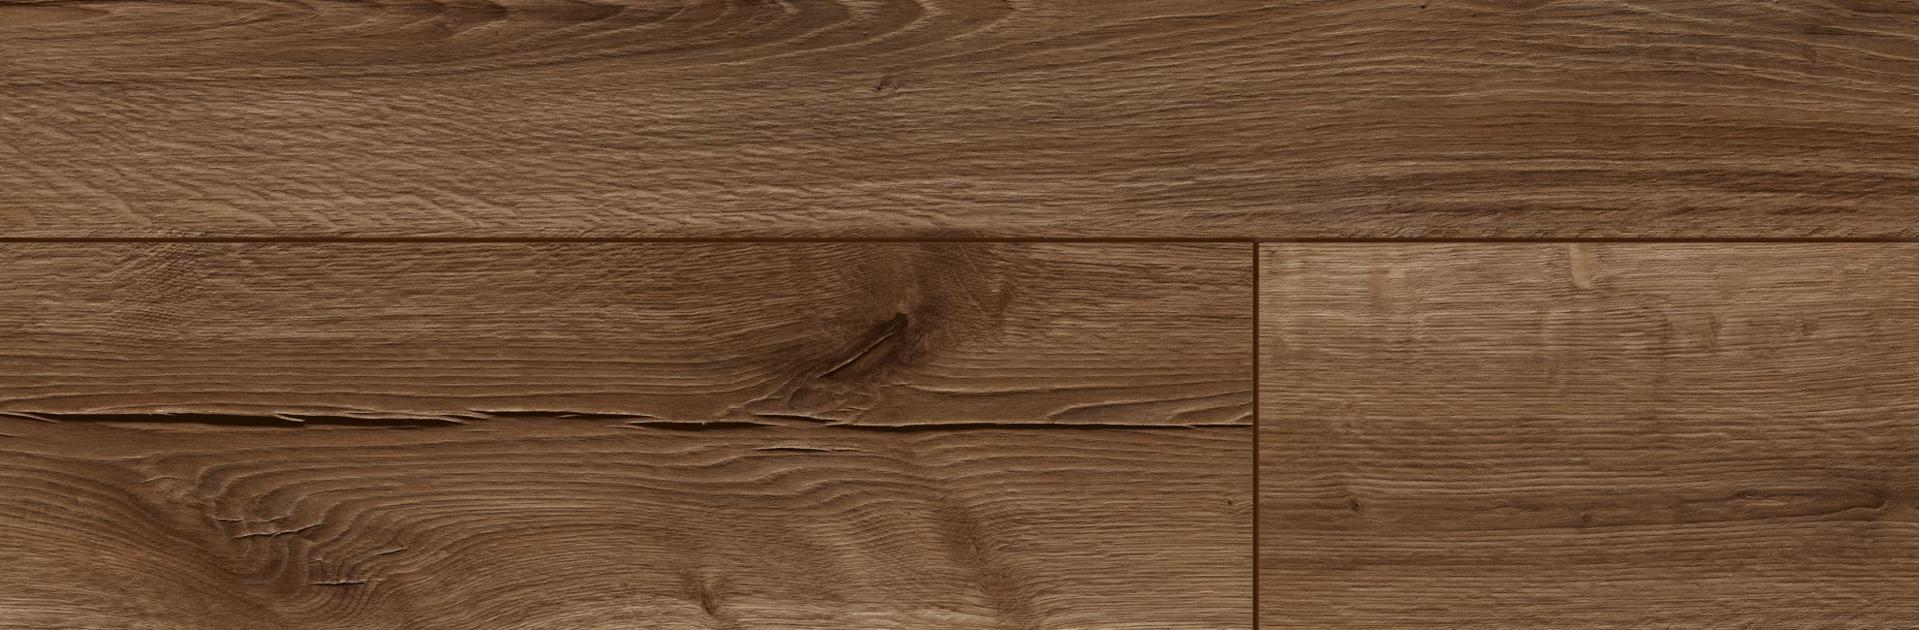 Ламинат Kronopol Aroma Aurum Barley Walnut D3882